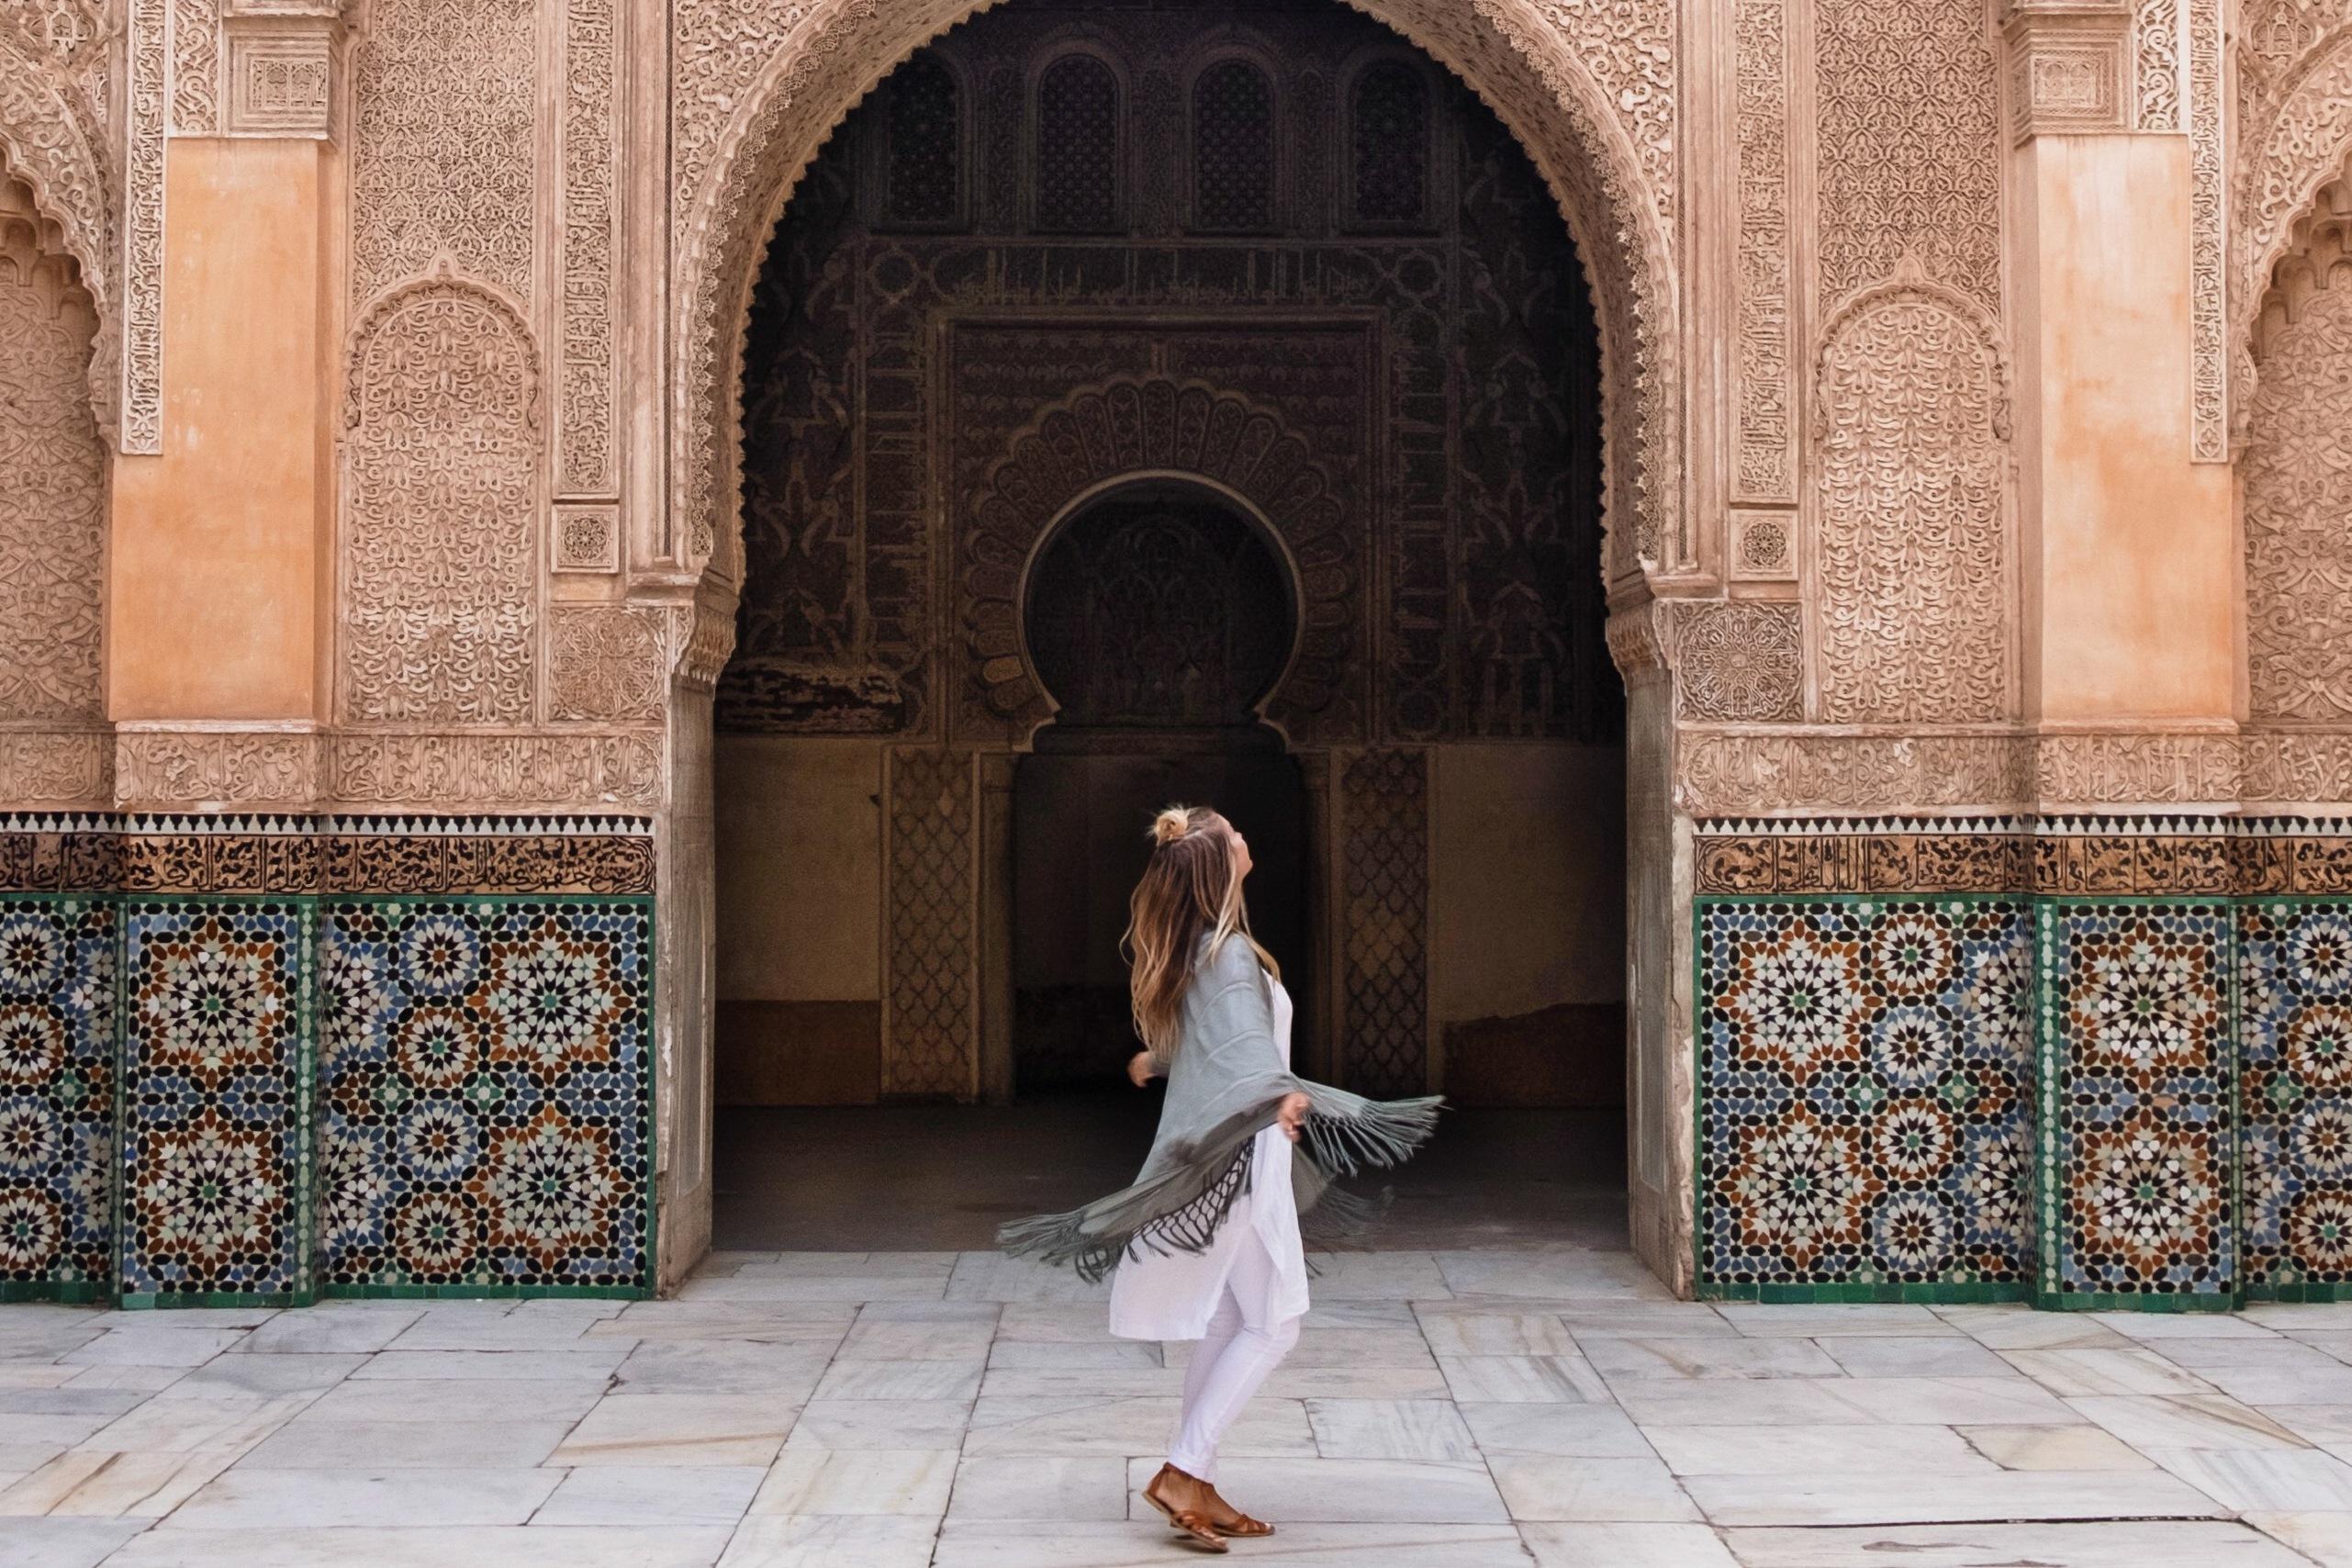 Touring Marrakech